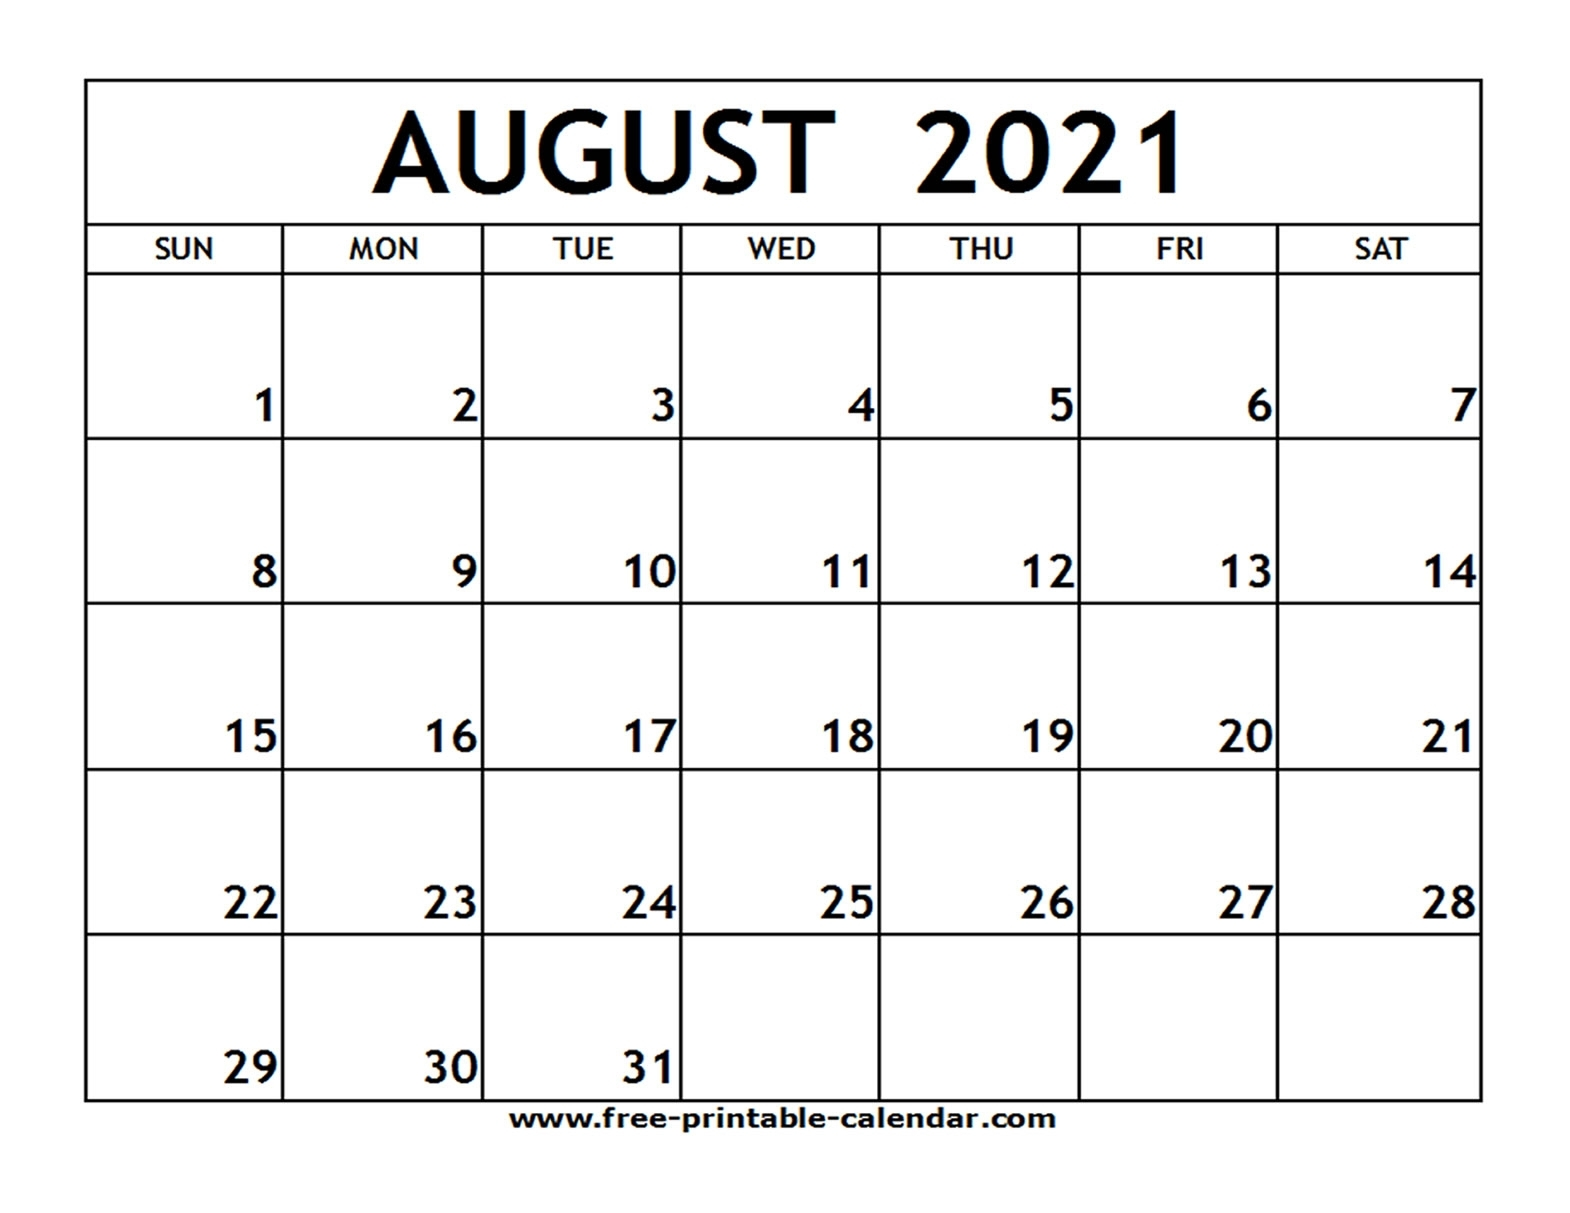 August 2021 Printable Calendar - Free-Printable-Calendar